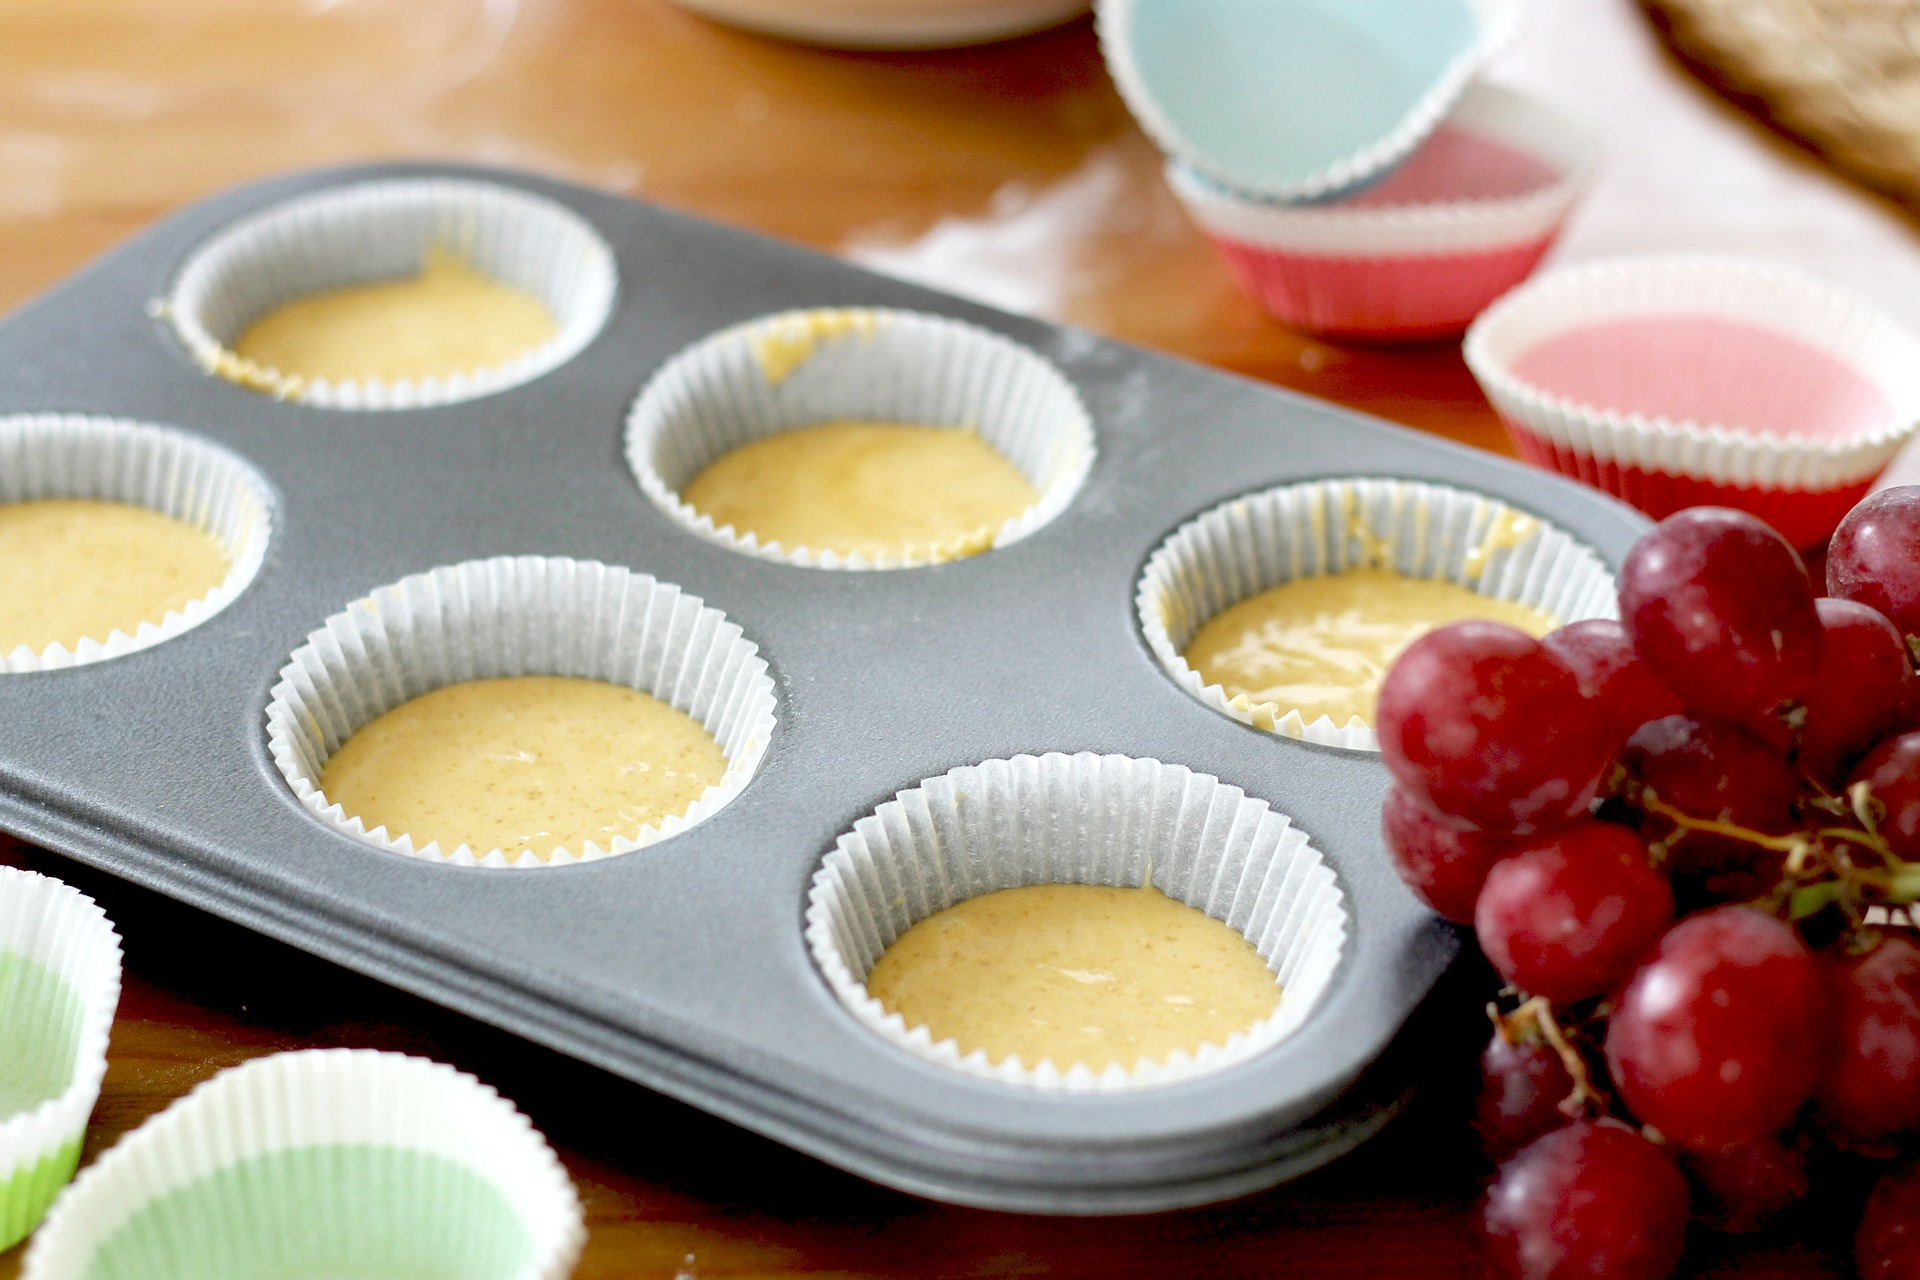 muffins-267298_1920